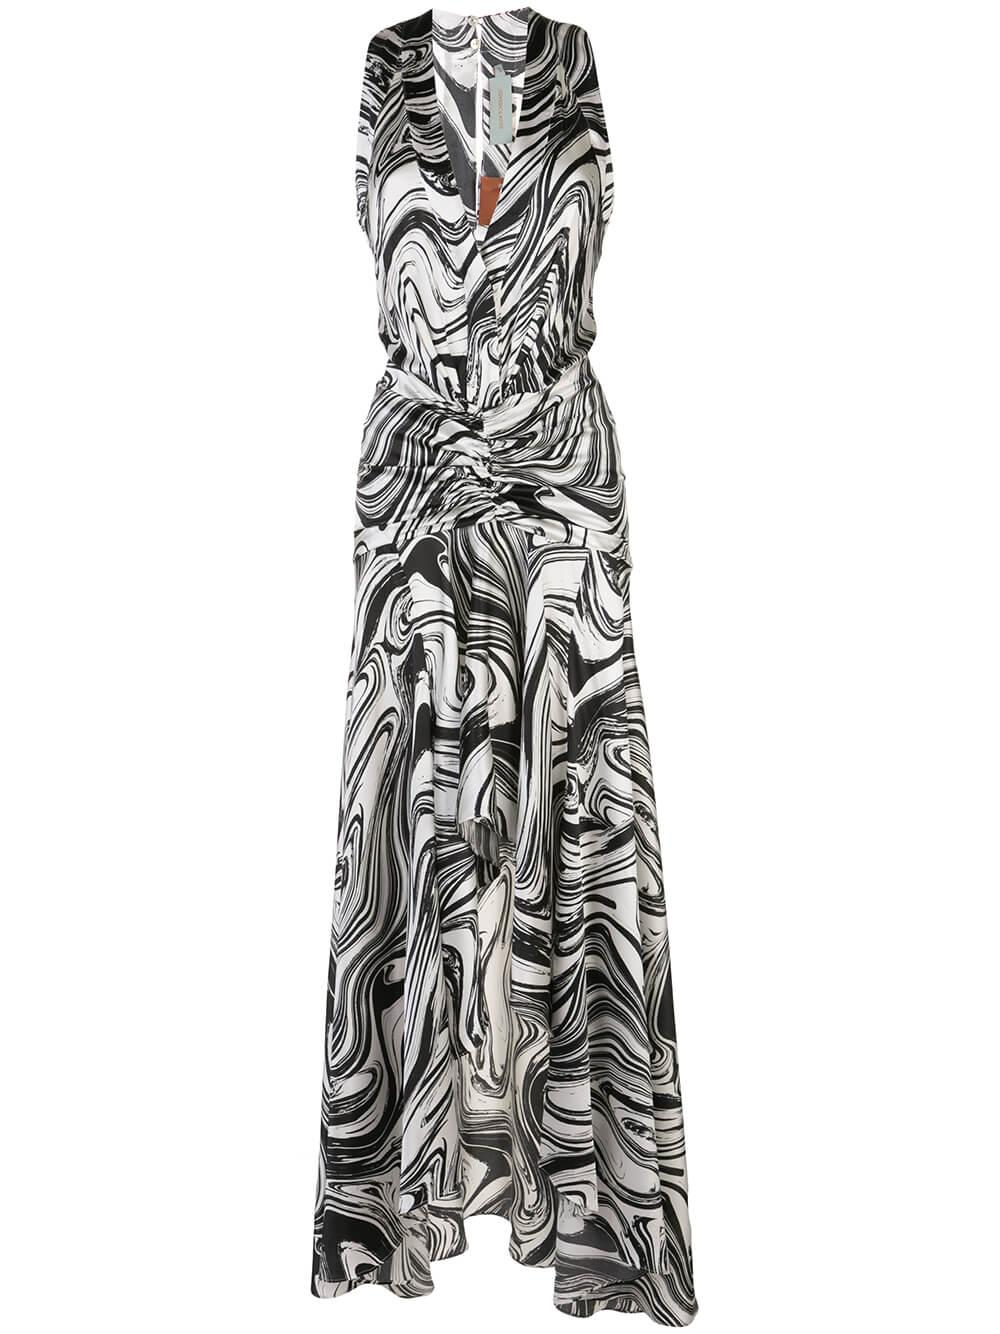 Egle Marble Print Maxi Dress